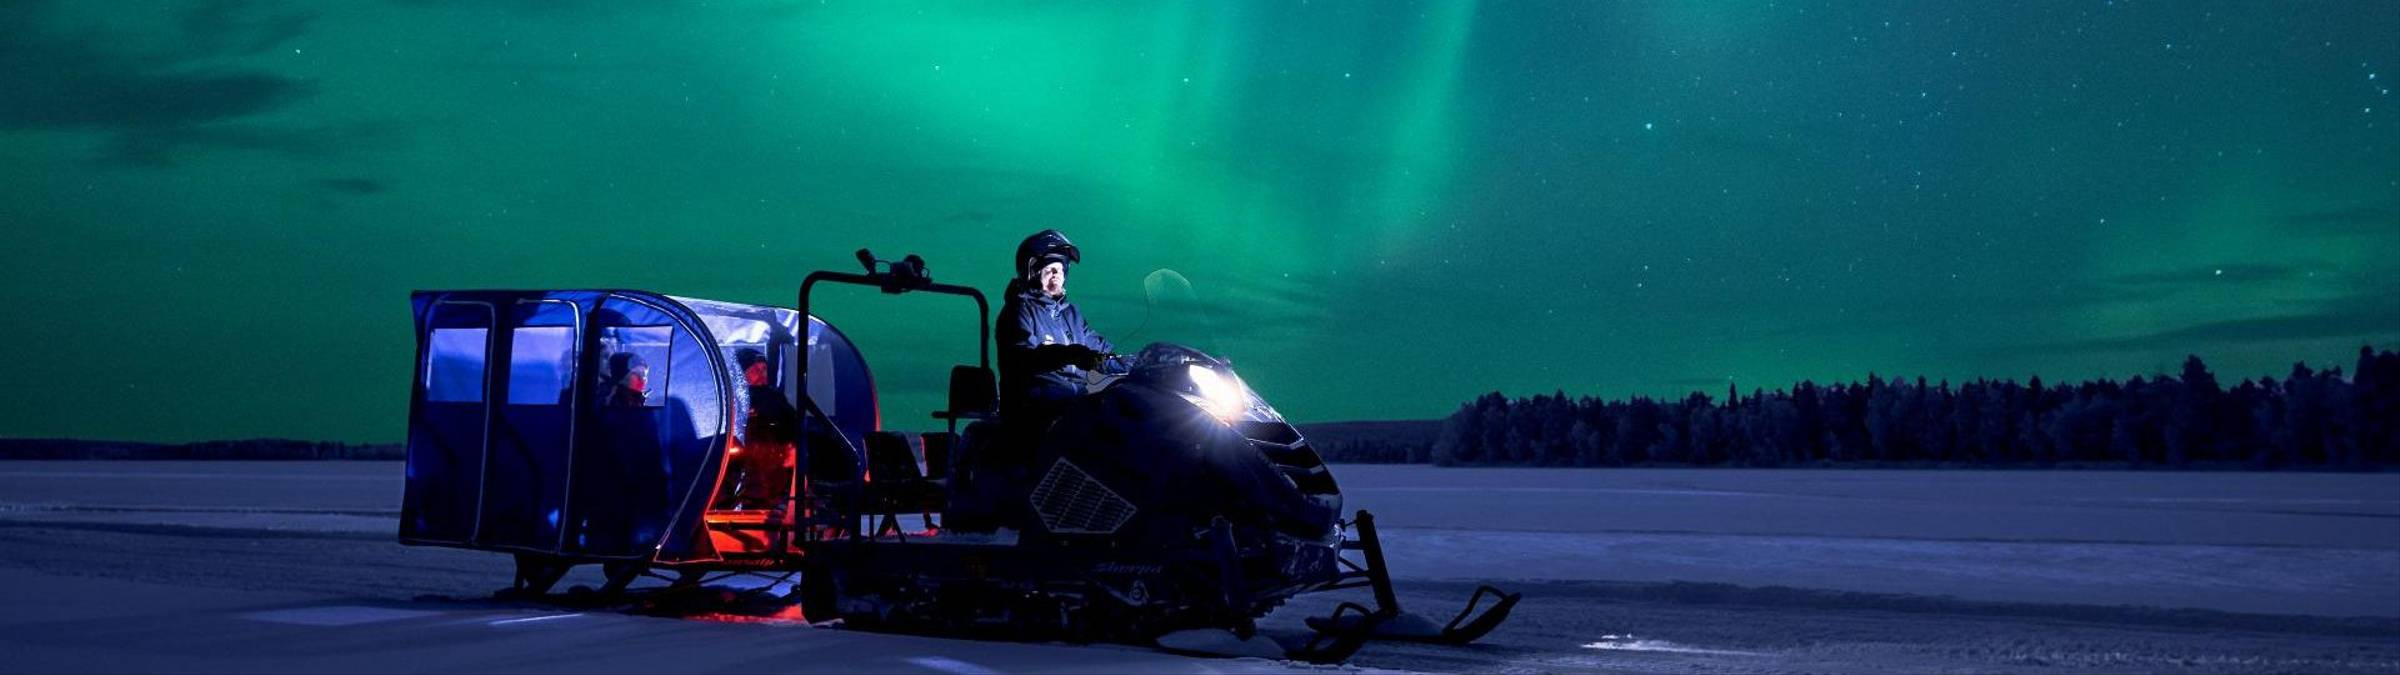 Aurora Hunt Snowtrain.jpg